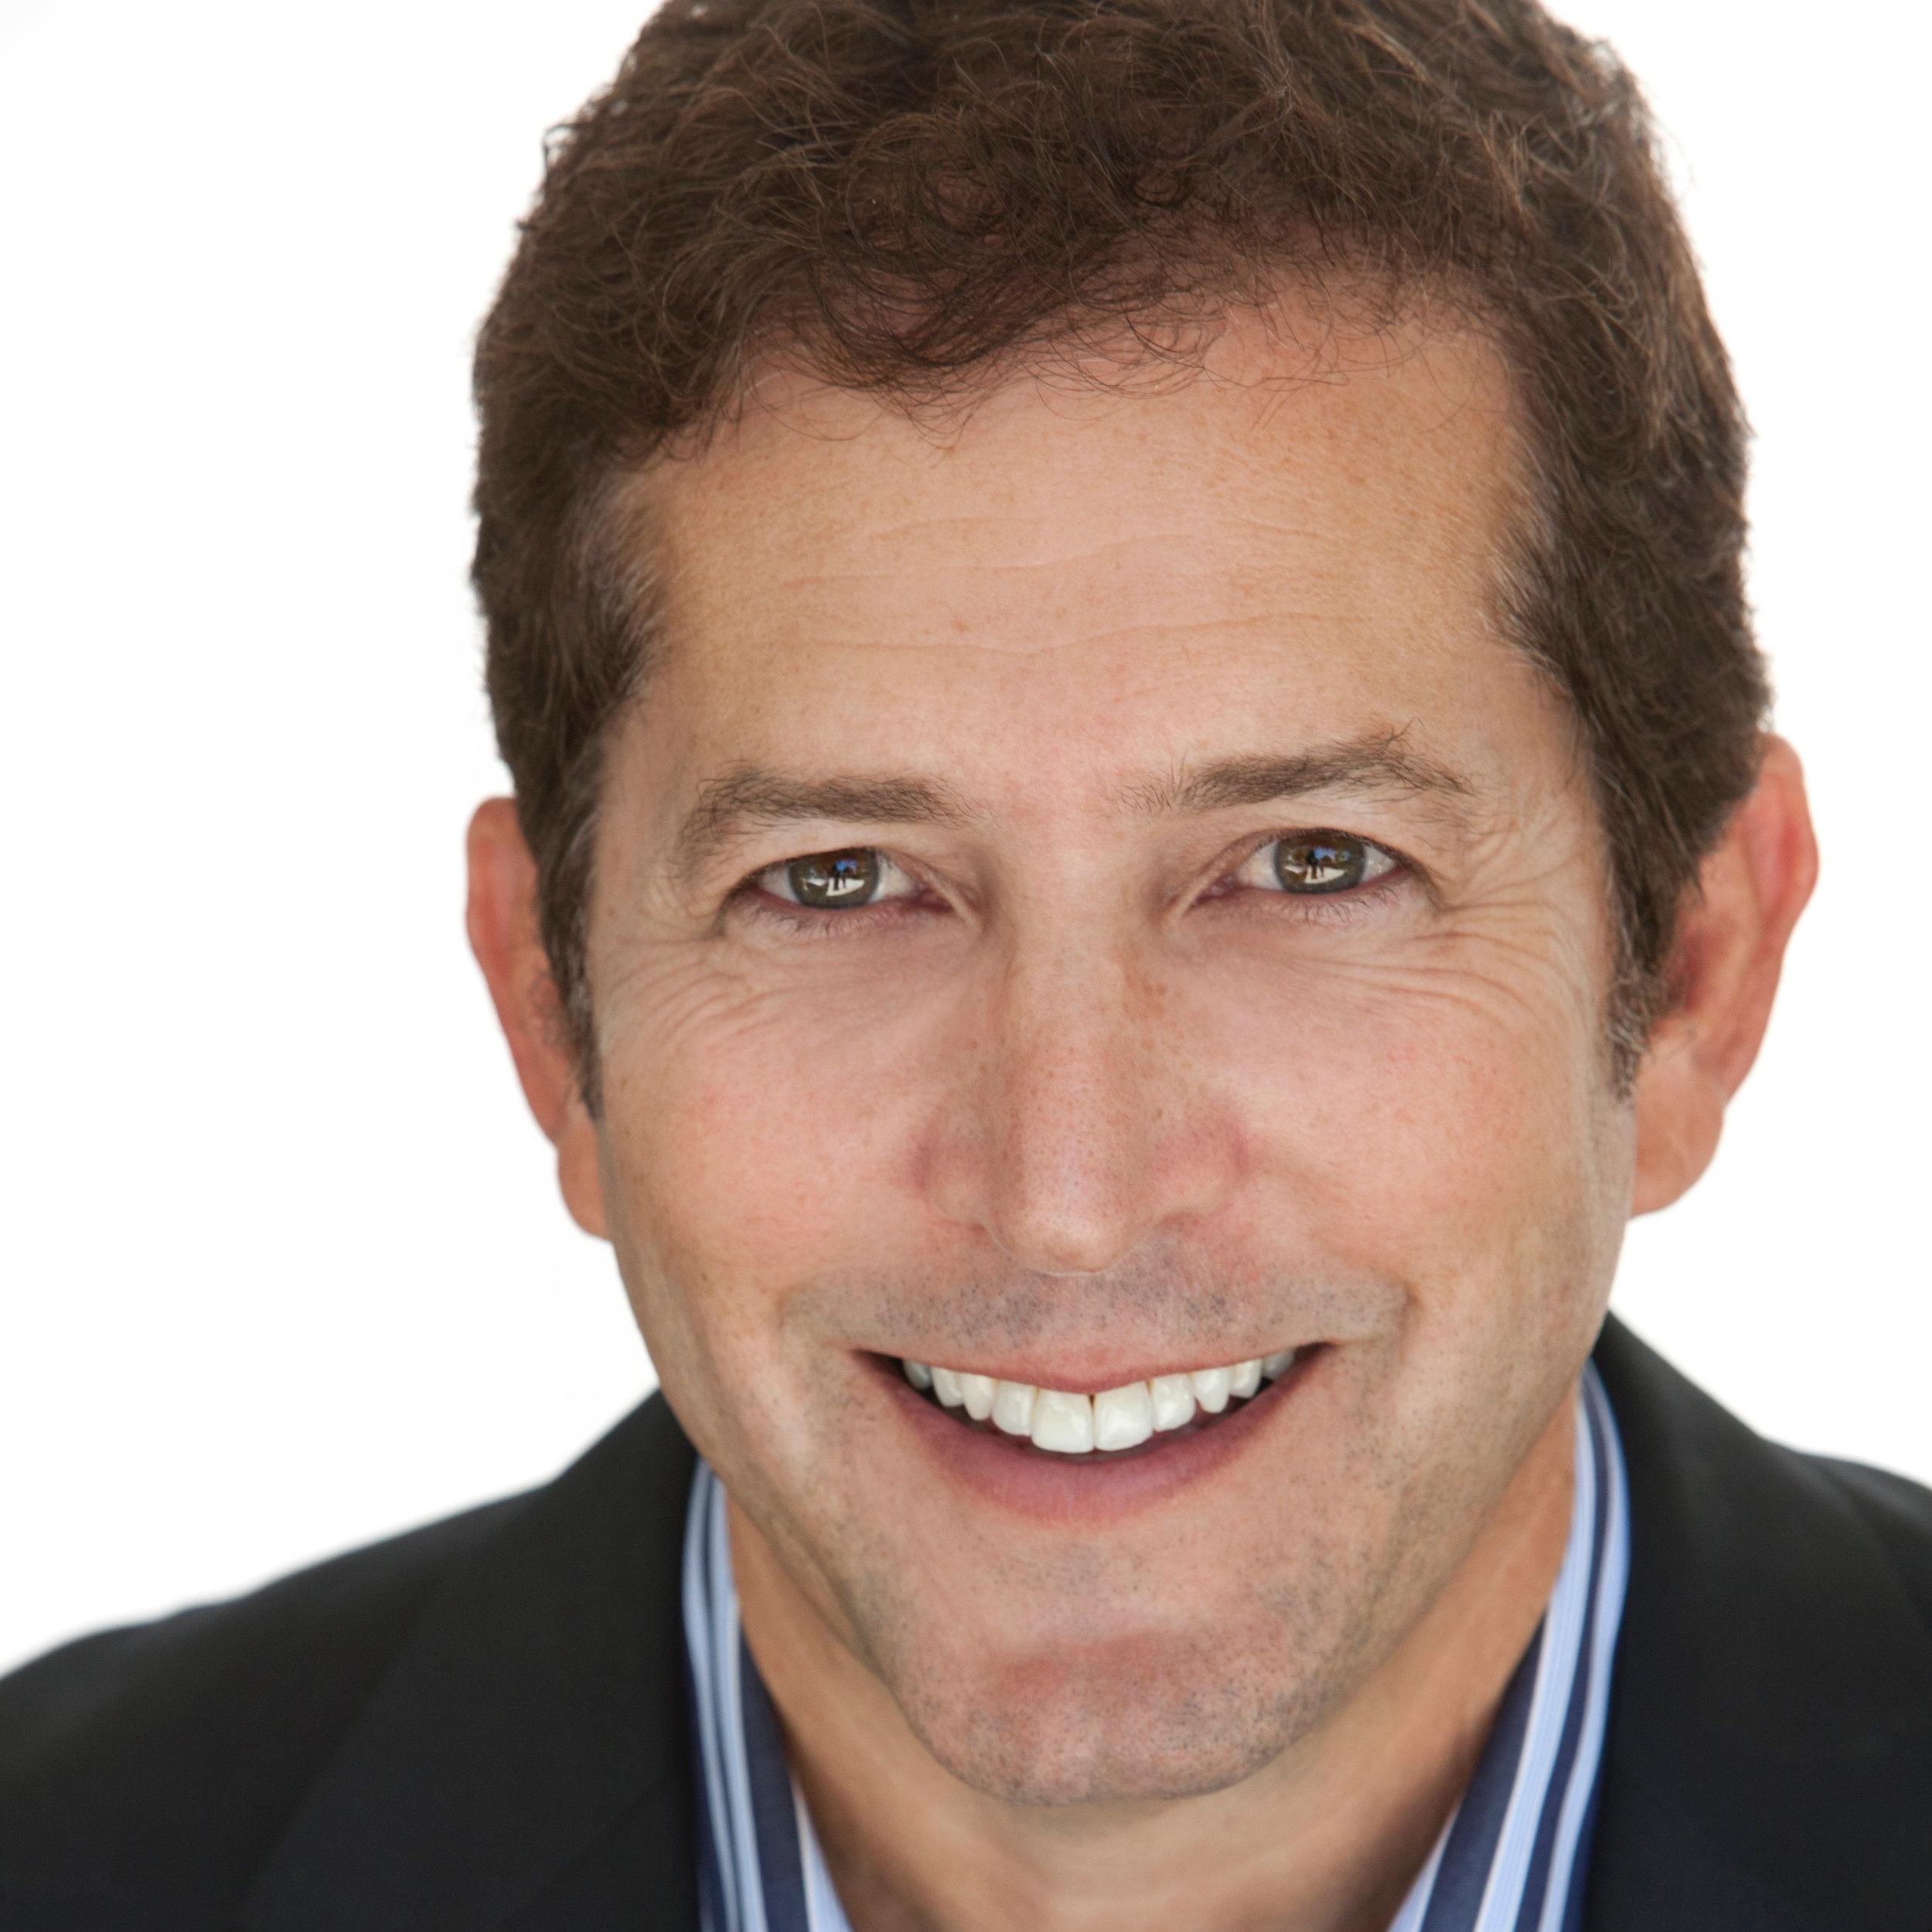 Eric Weiss - PresidentThe Weiss Agency